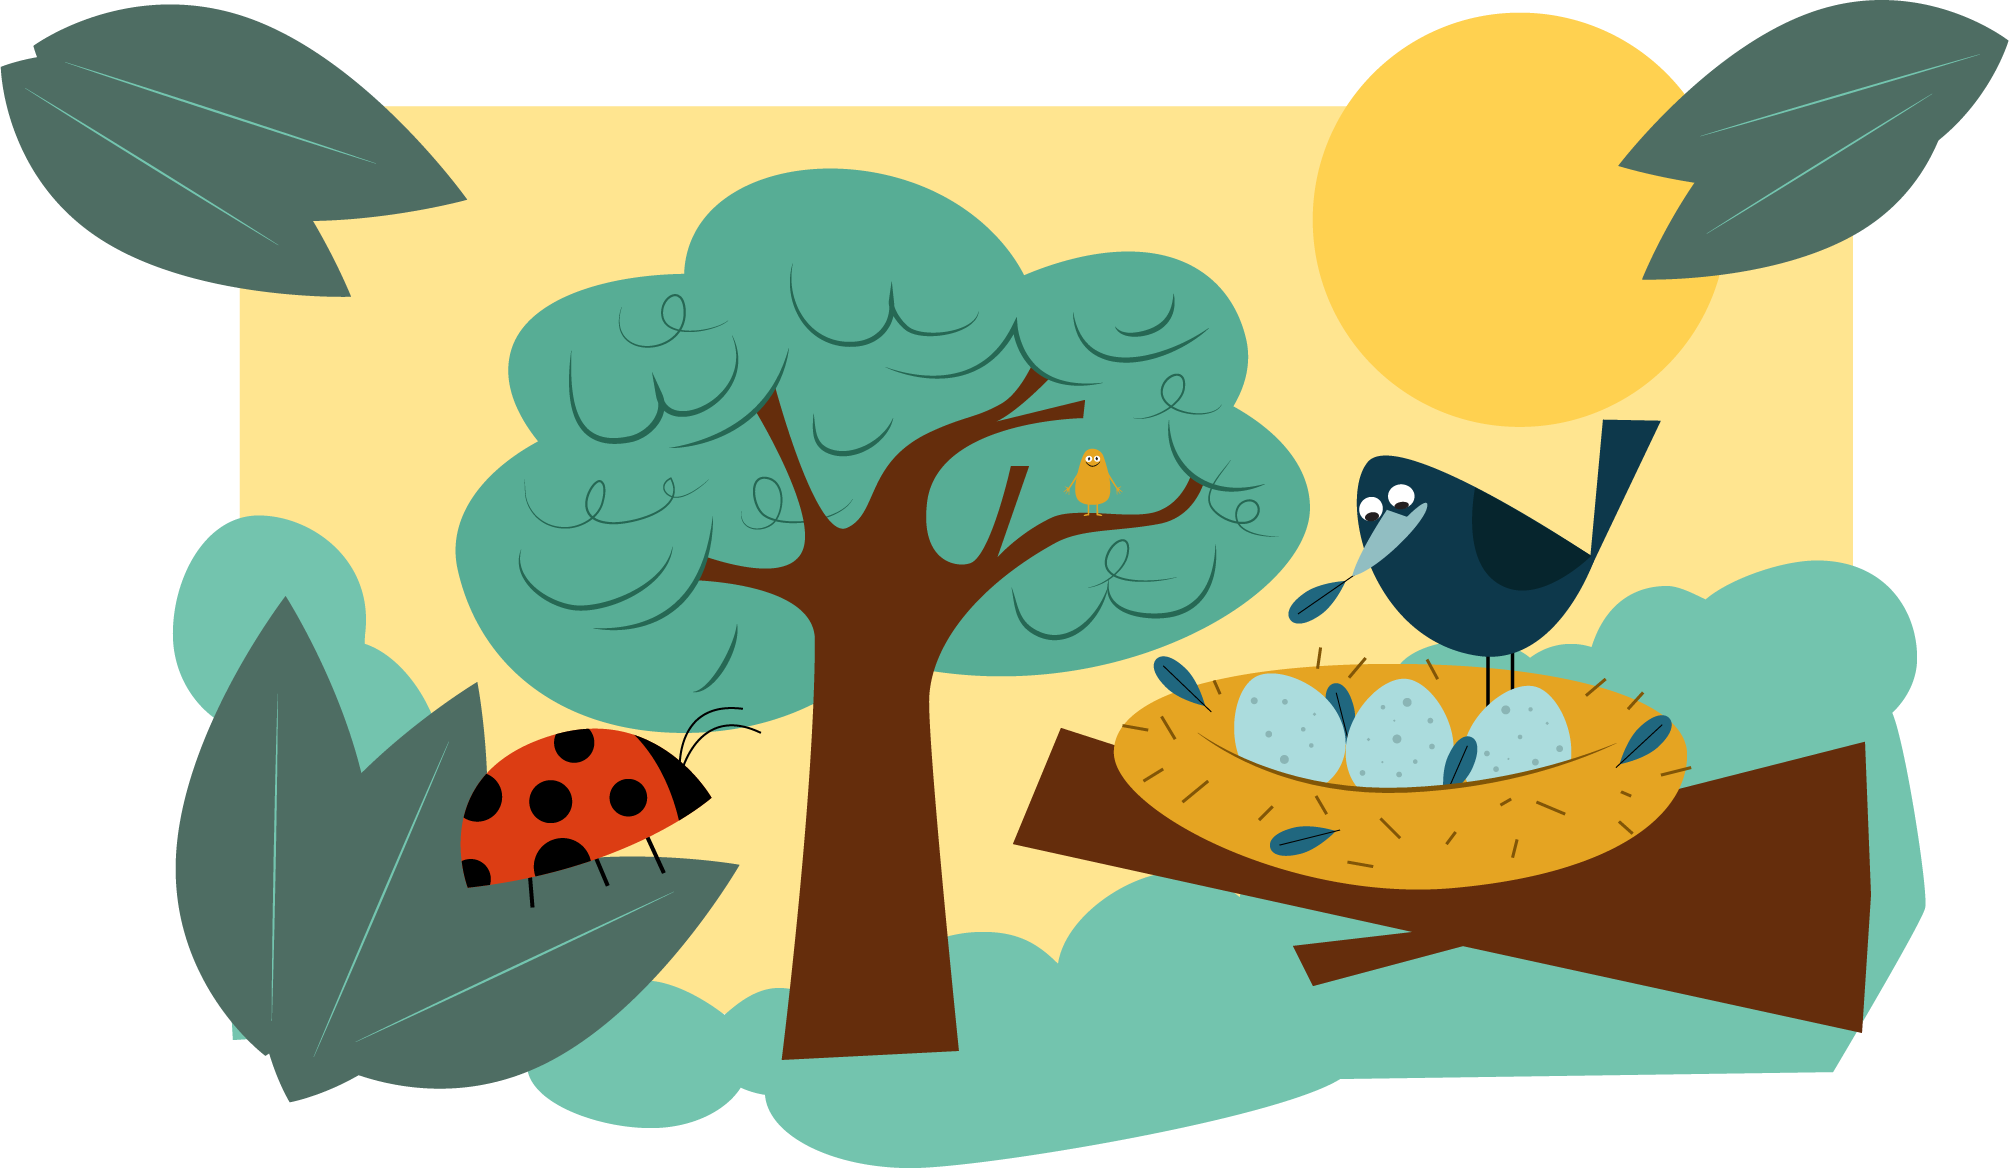 Tree-bird-nest 02.png